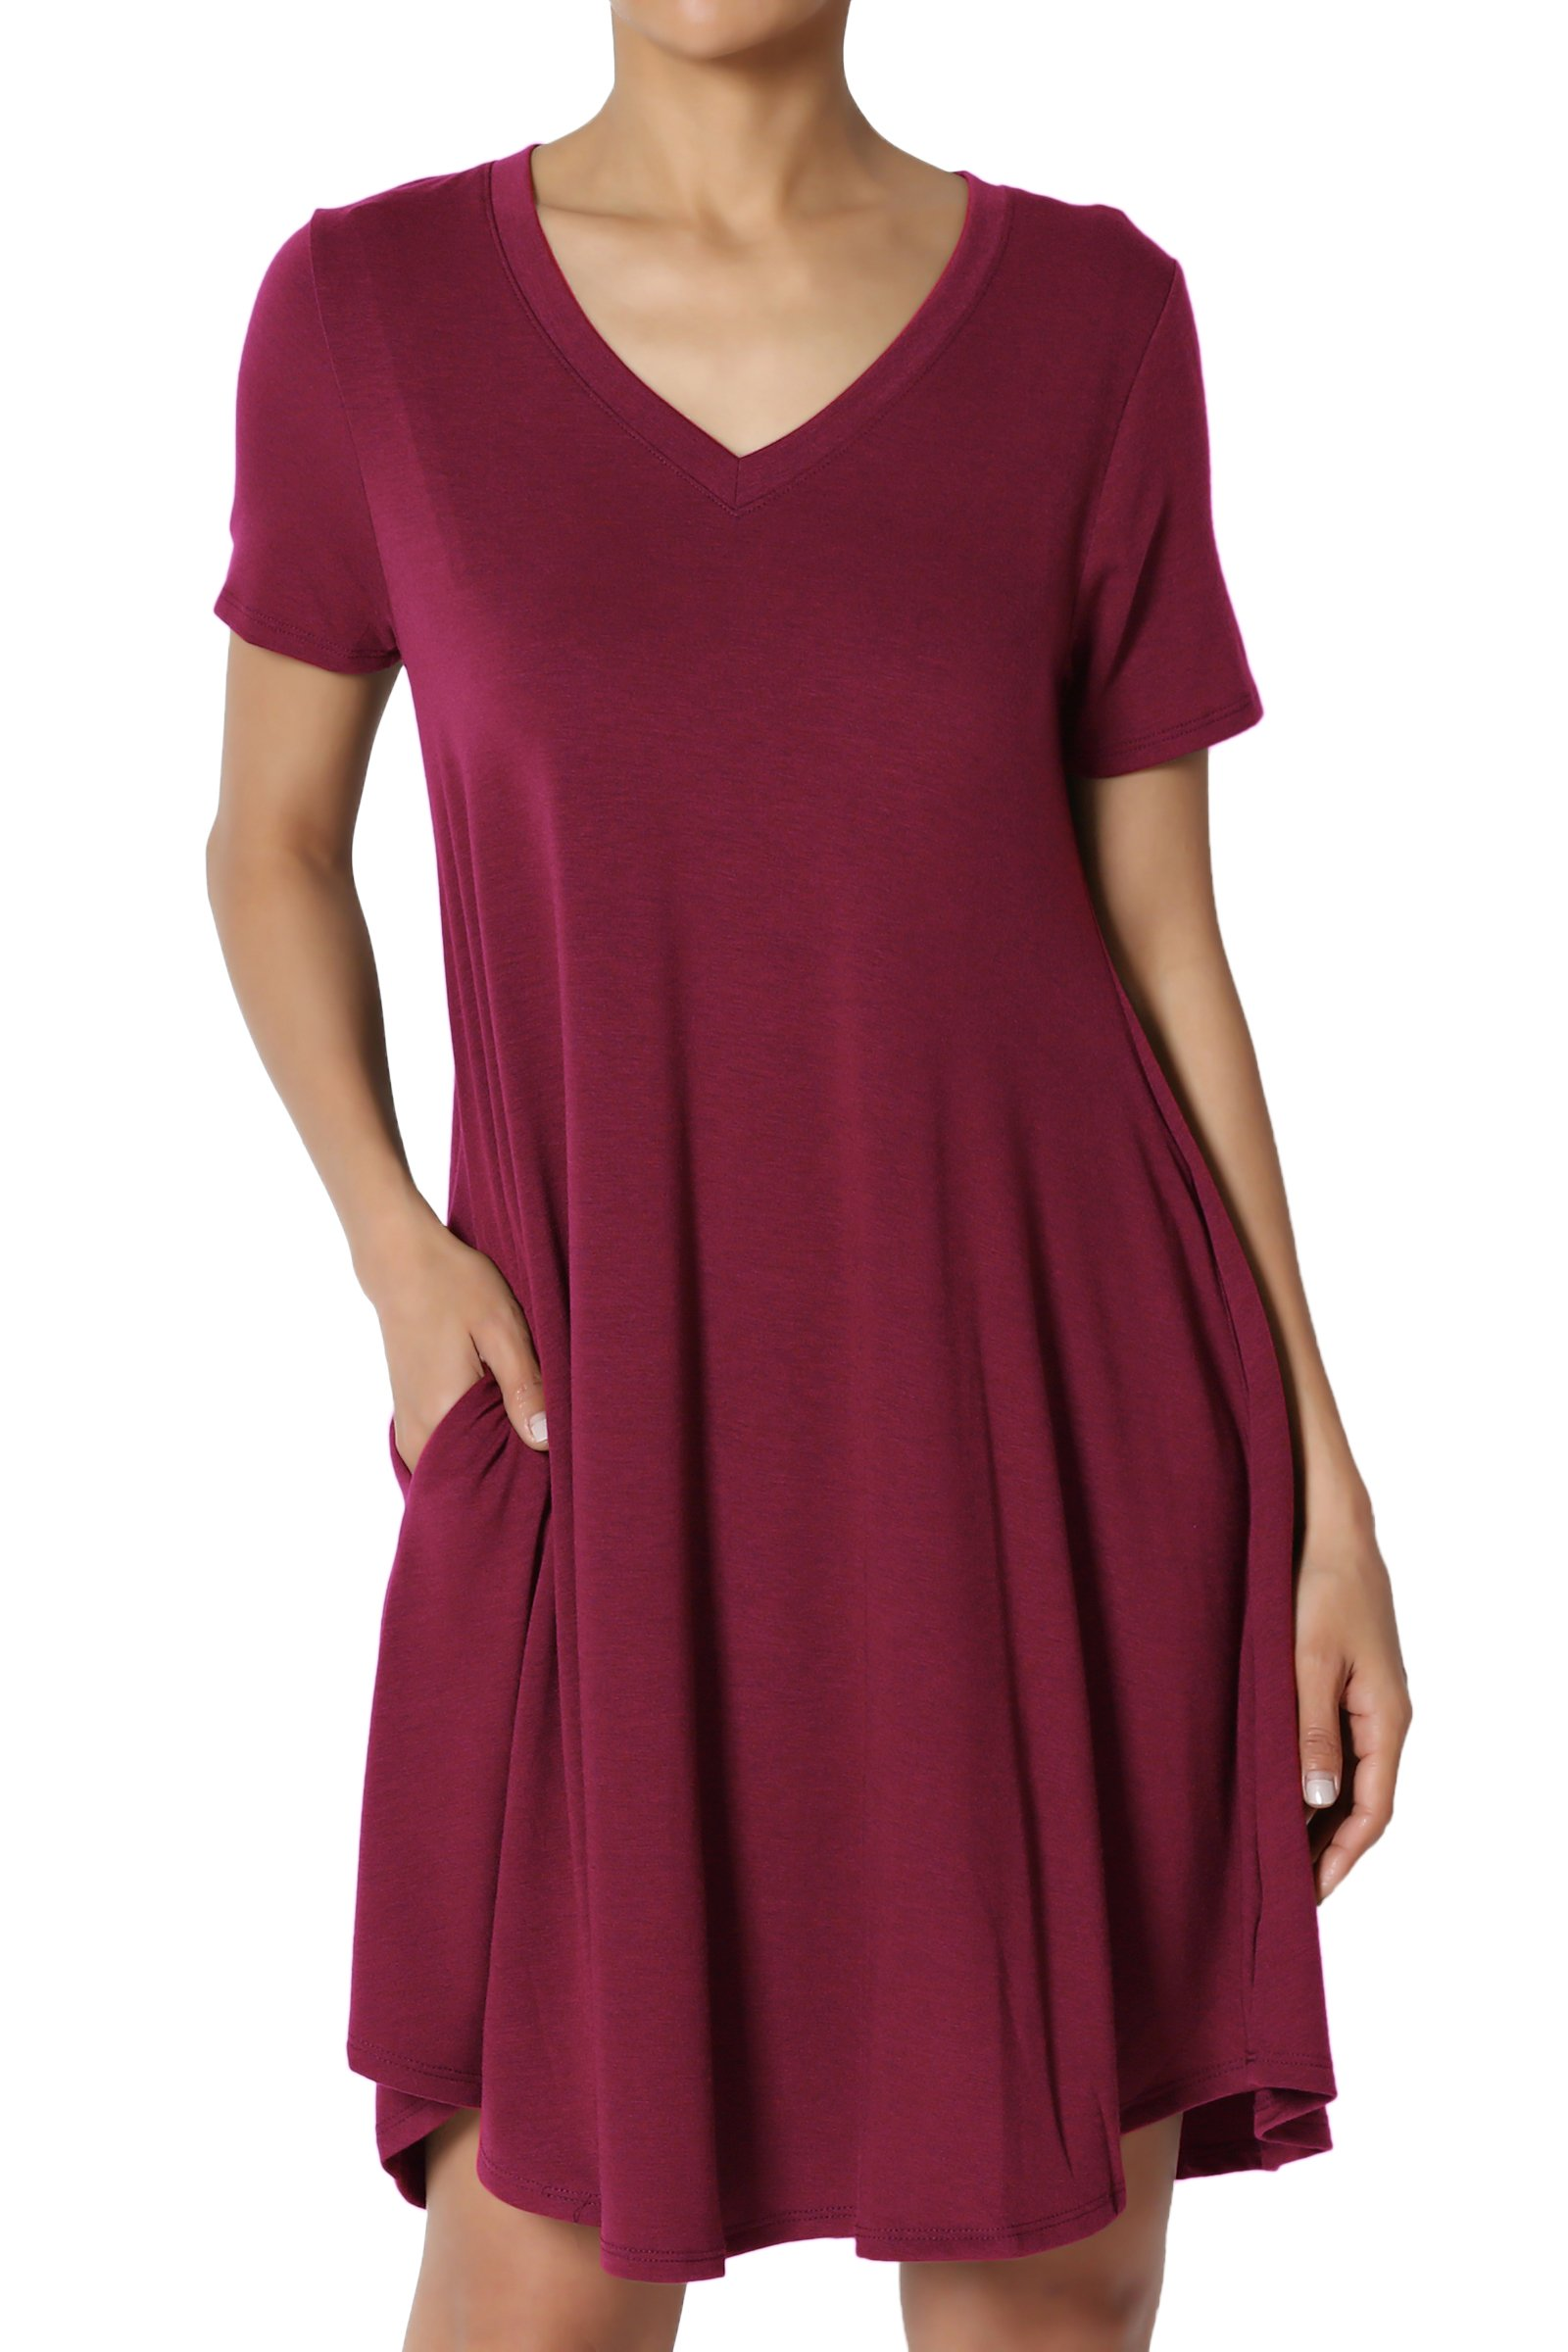 TheMogan Women's V-Neck Short Sleeve Draped Jersey Pocket Tunic Dress Wine 2XL